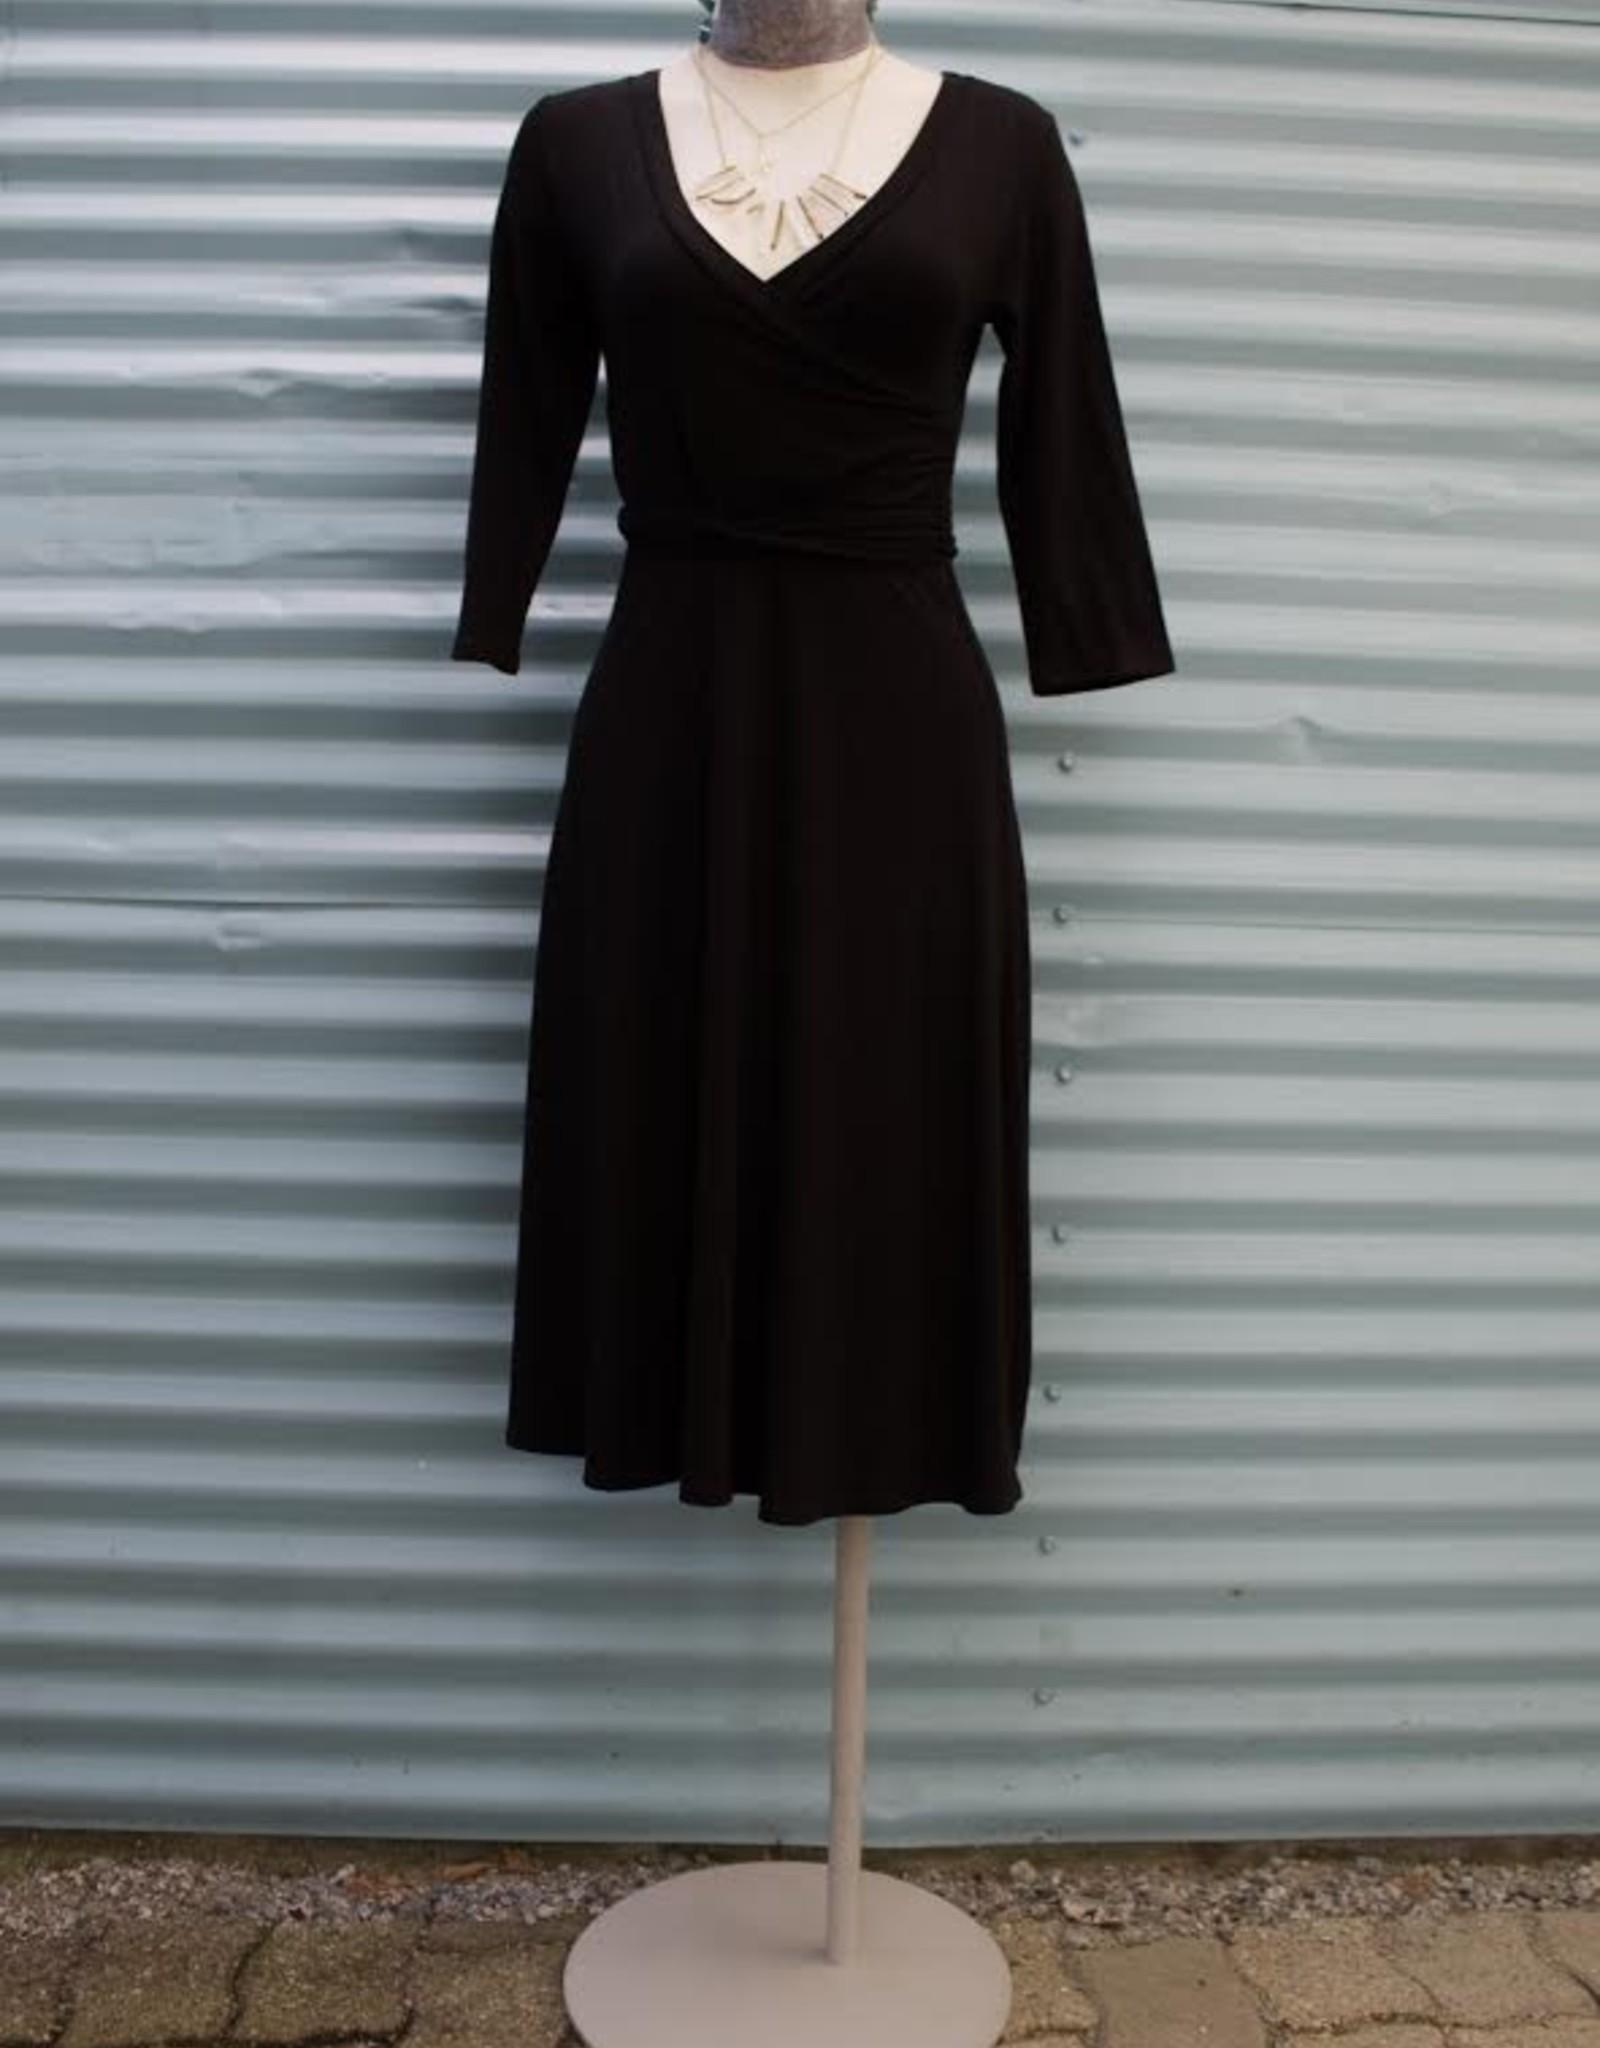 Gilmour Bamboo Faux Wrap Dress, Gilmour, Black